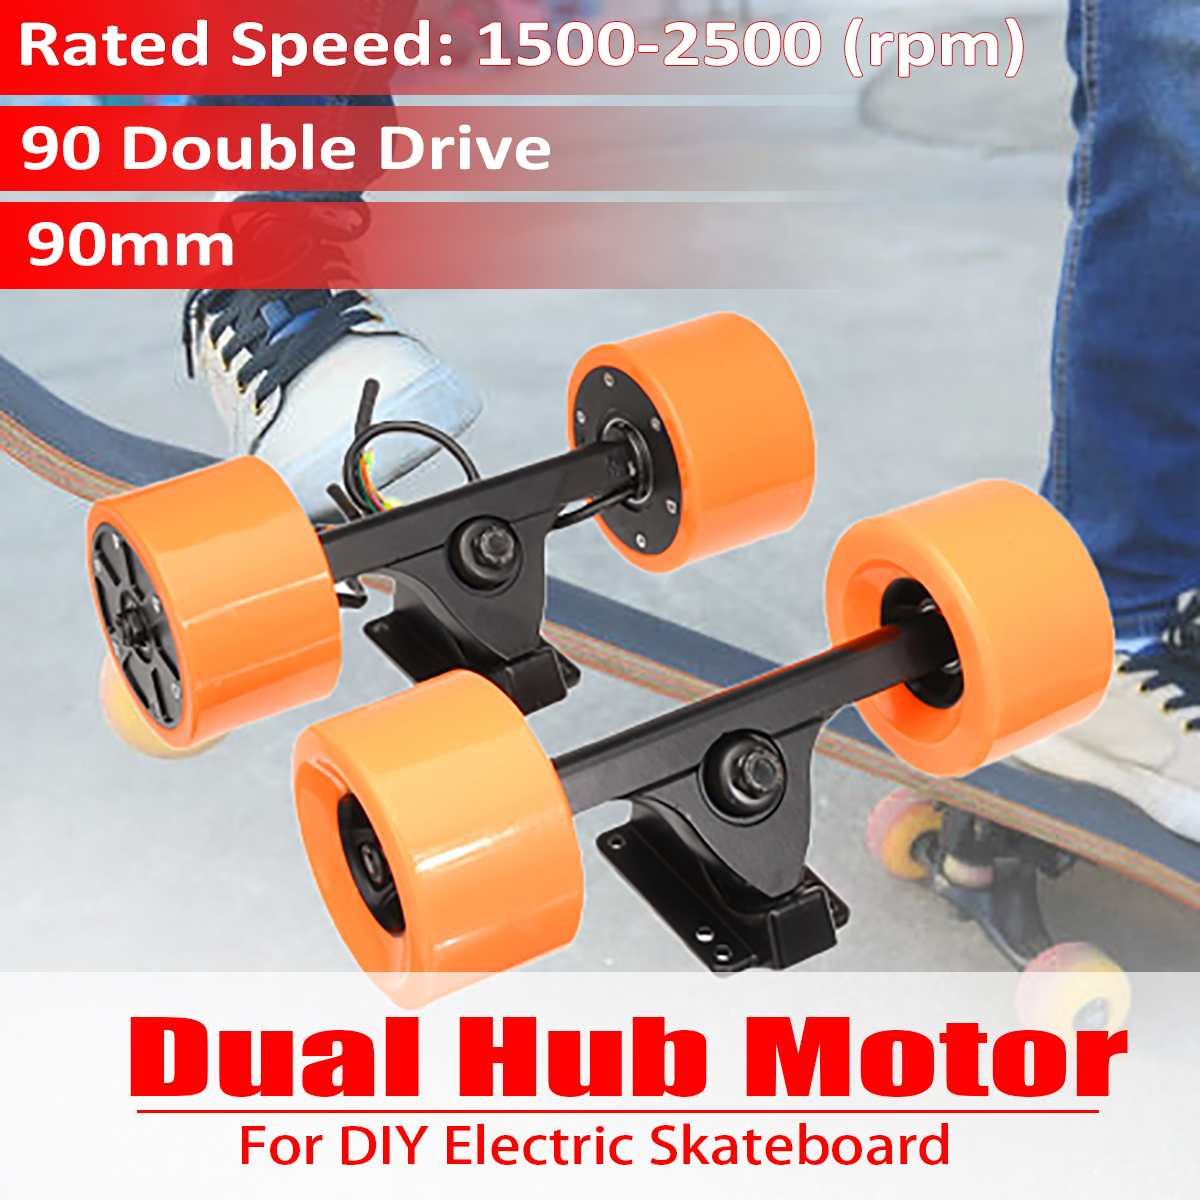 Professional 90mm 600W Dual Drive Electric Skateboard Hub Motor Kit DC Brushless Remote Controll Scooter Drive Hub Motor